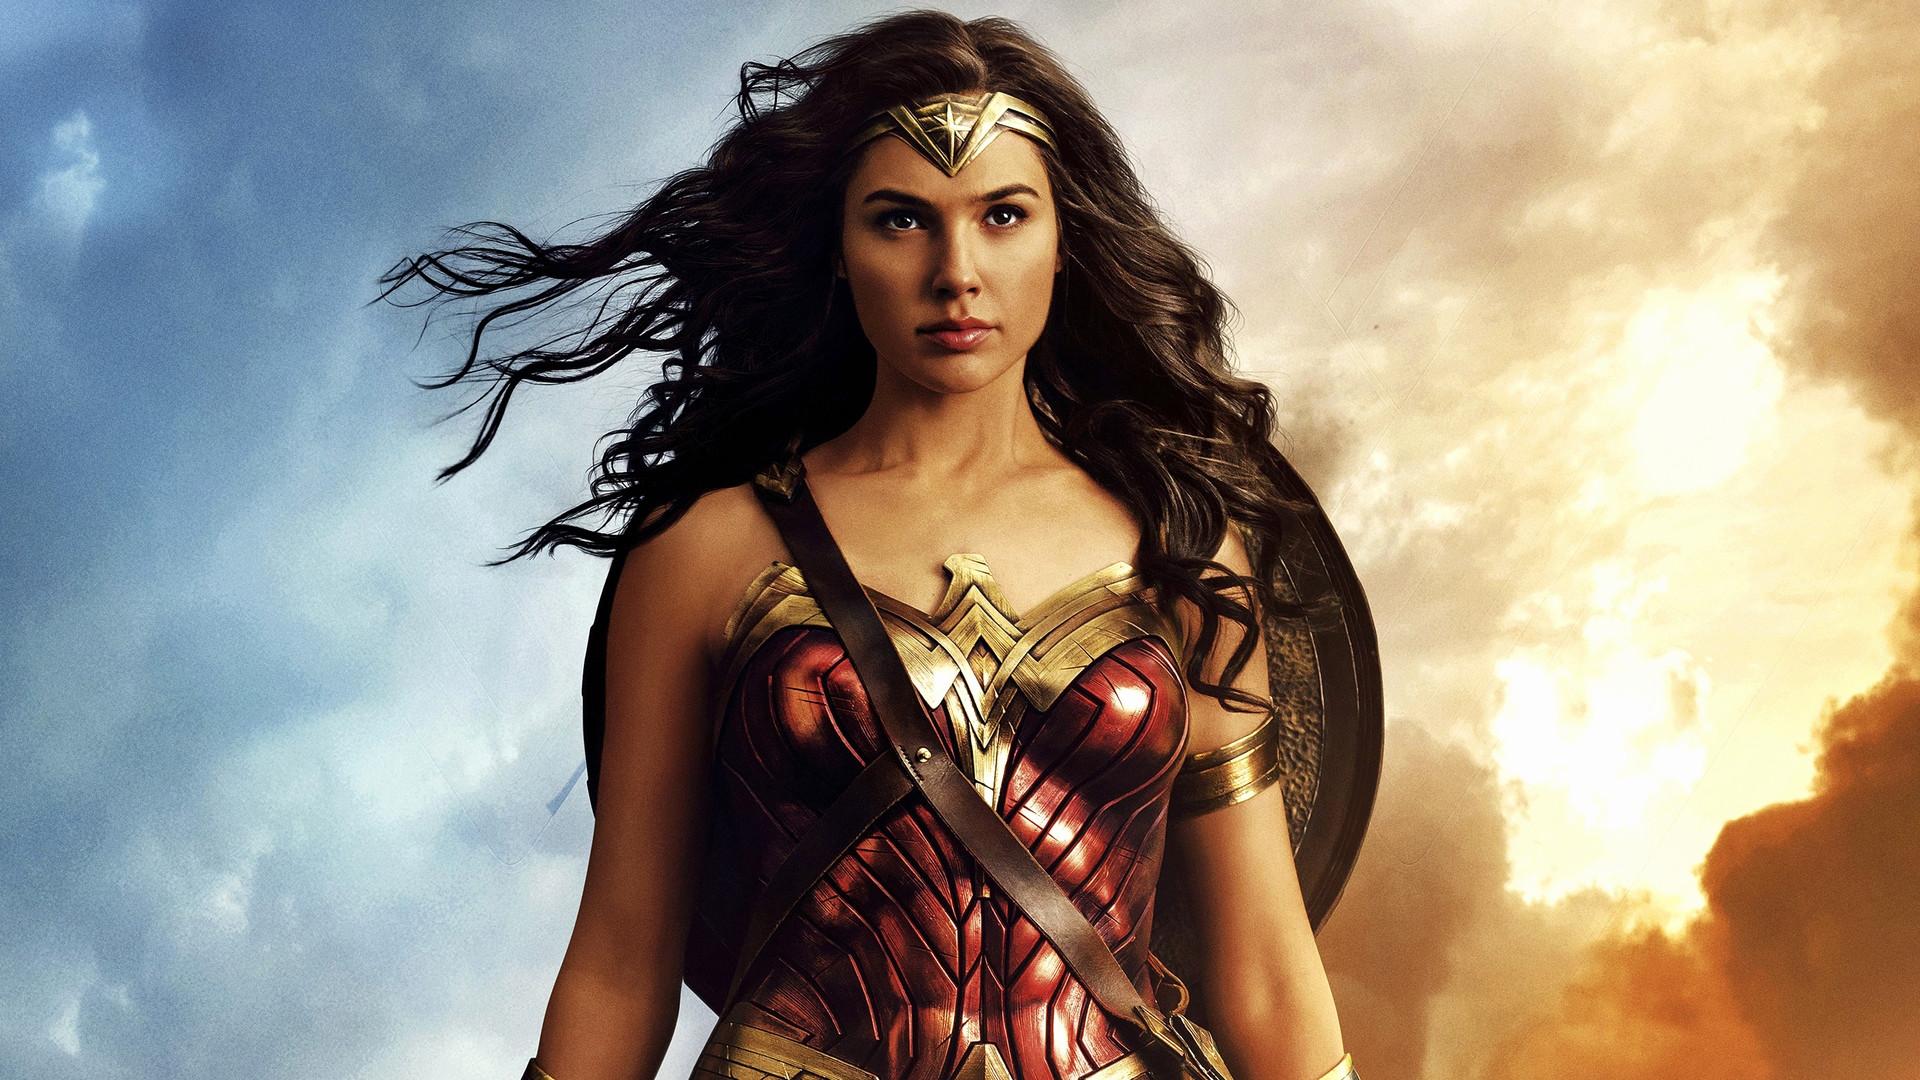 Res: 1920x1080, Wonder Woman Wallpaper Lovely Wonder Woman 2017 Movie Gal Gadot Wallpaper